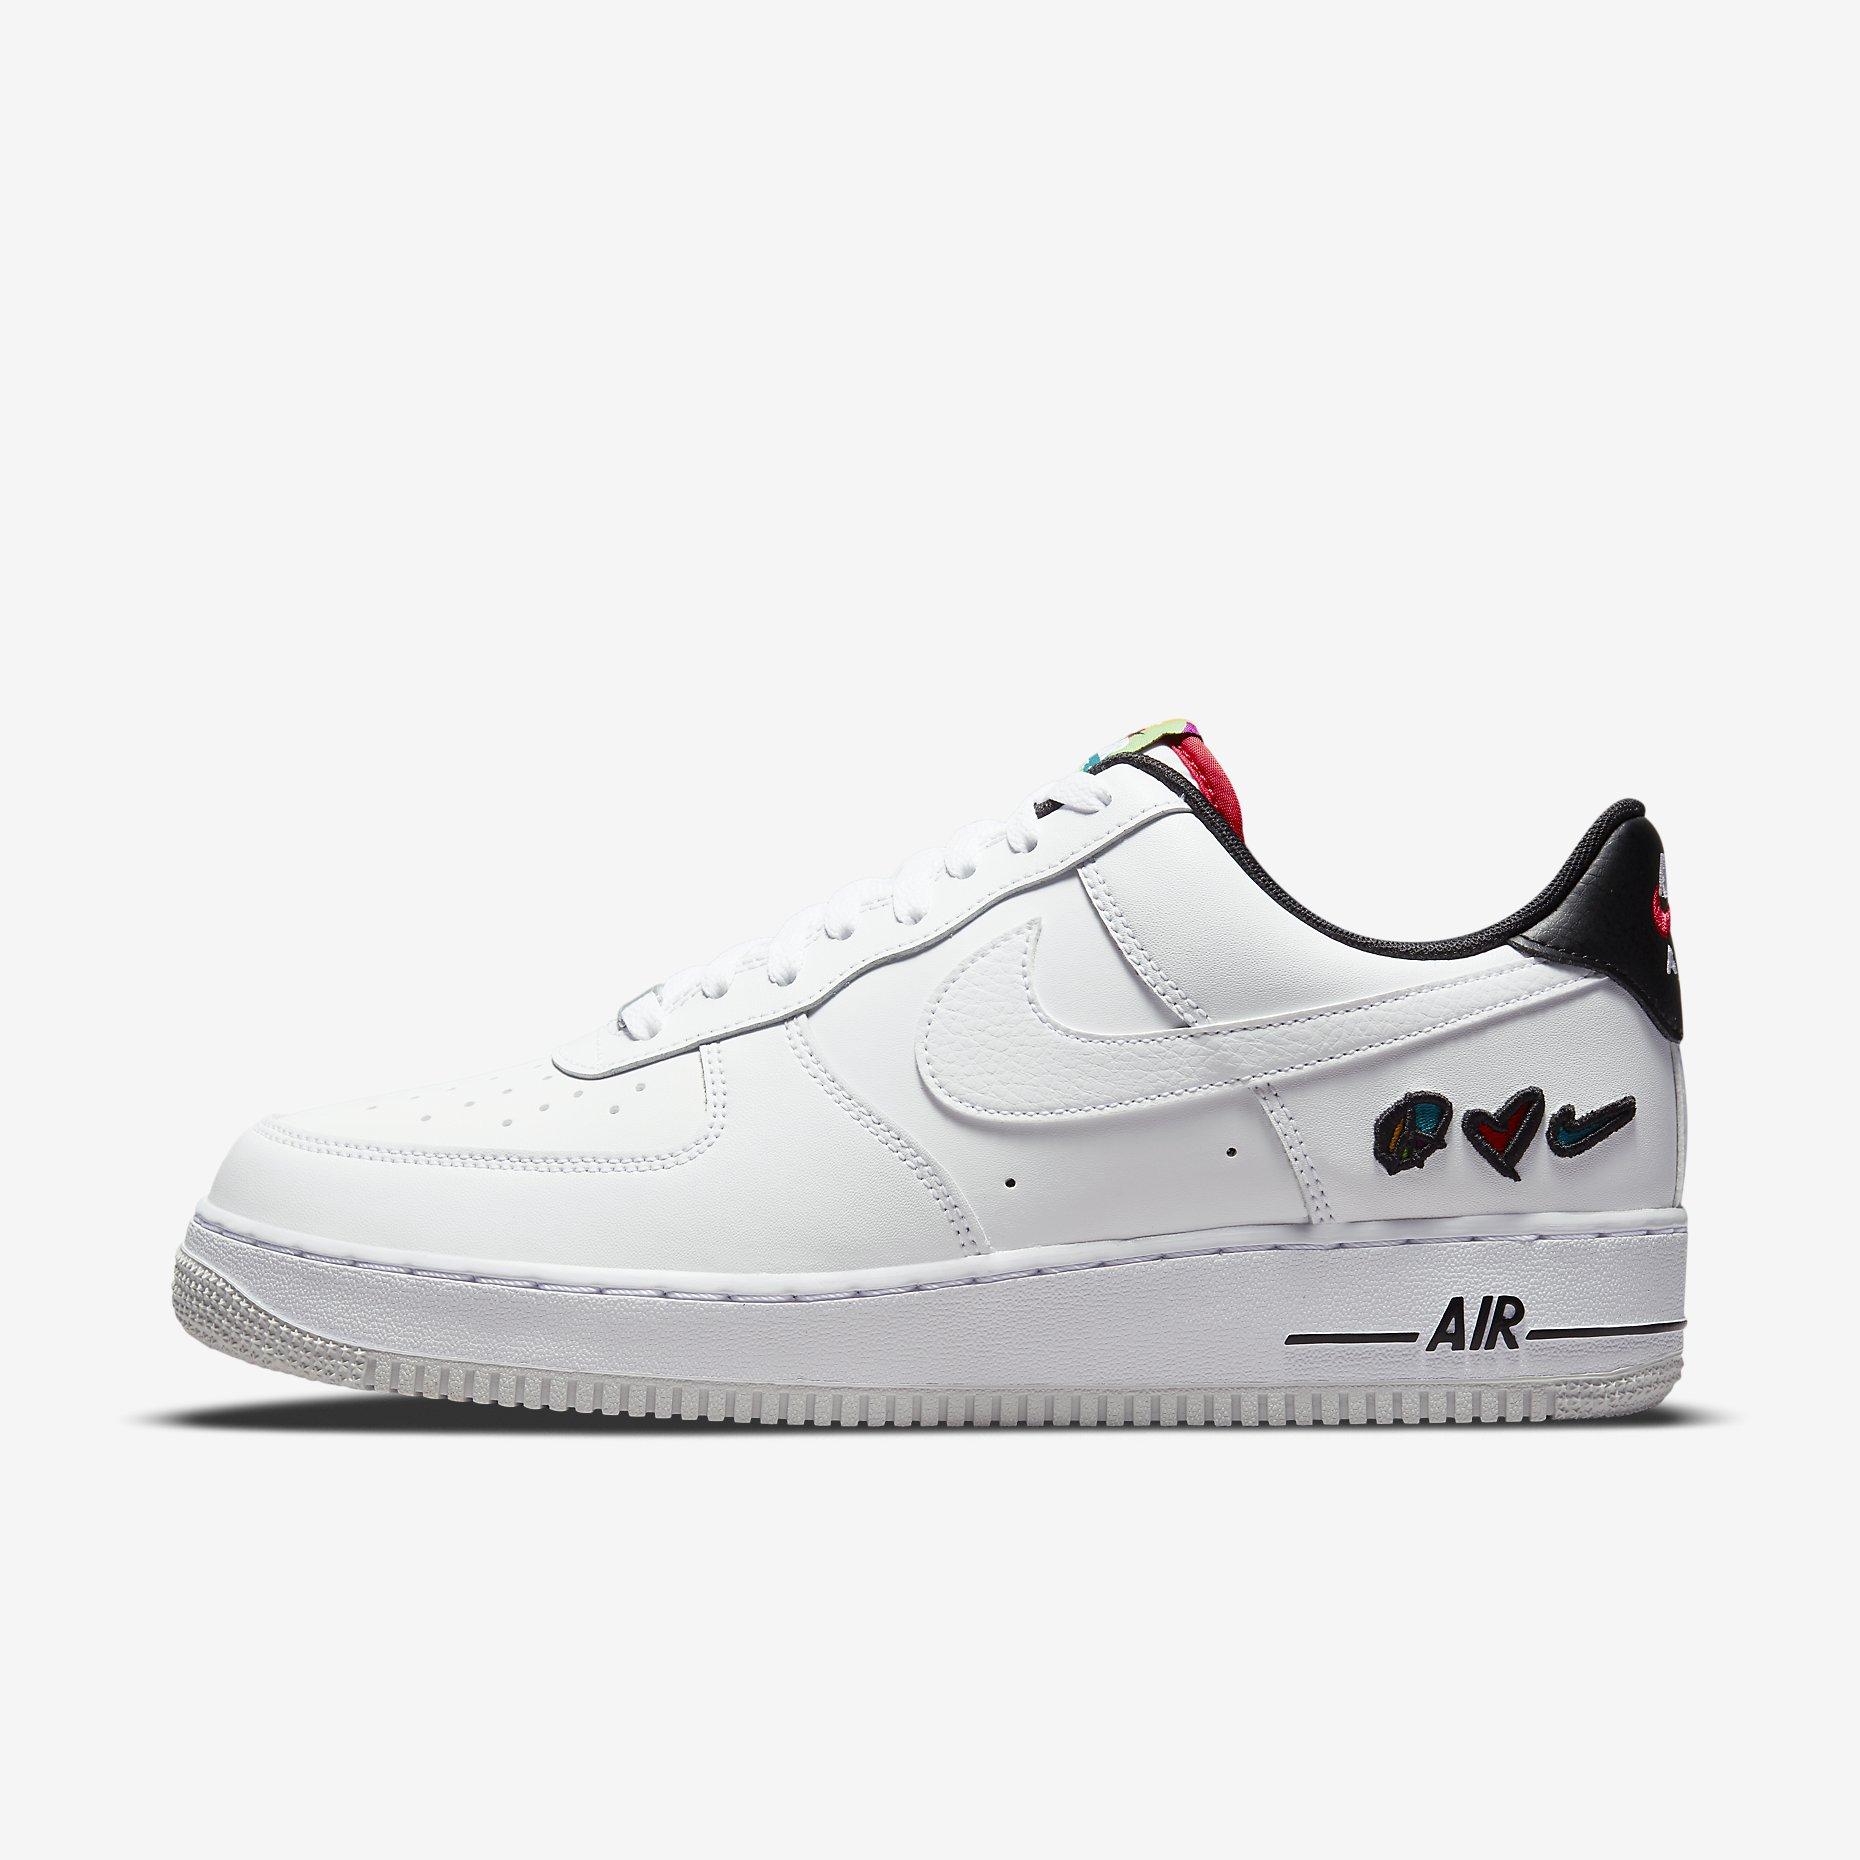 Nike Air Force 1 '07 LV8 'Peace, Love, Swoosh'